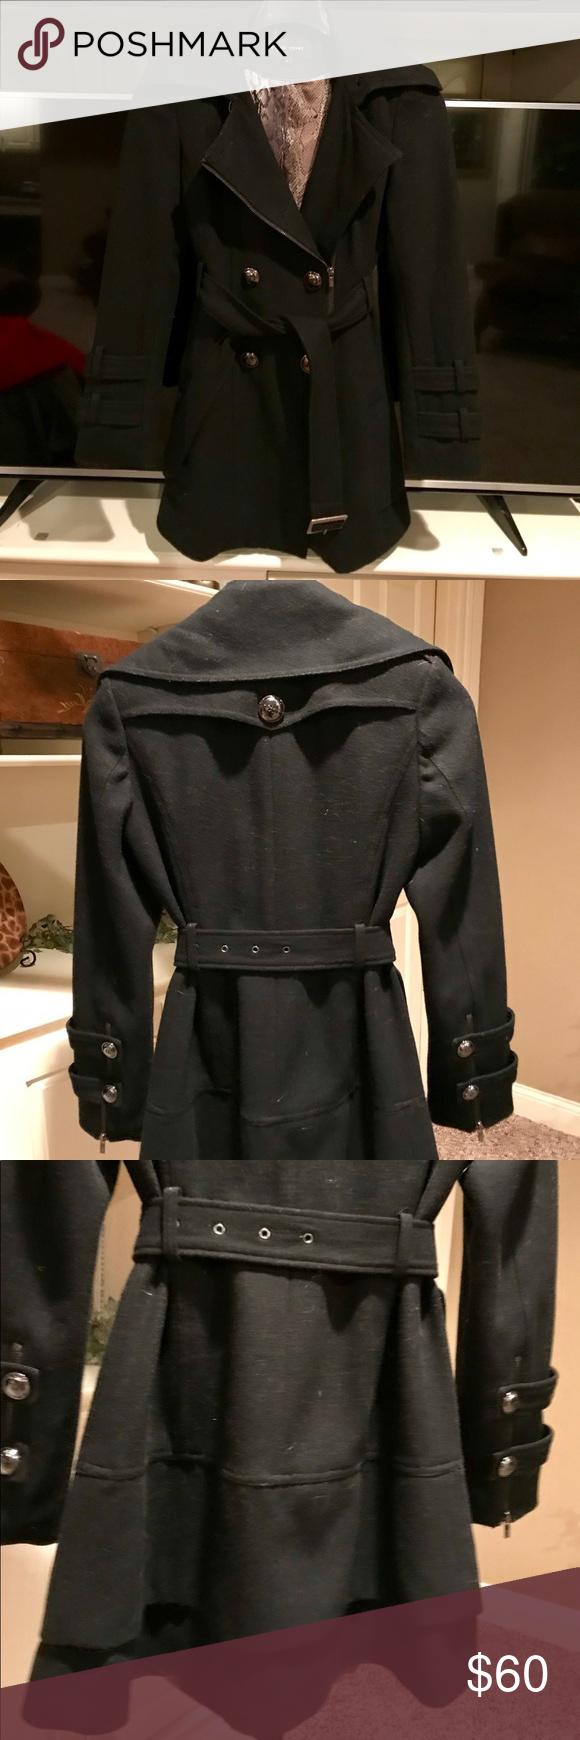 Women's black rivet wool peacoat